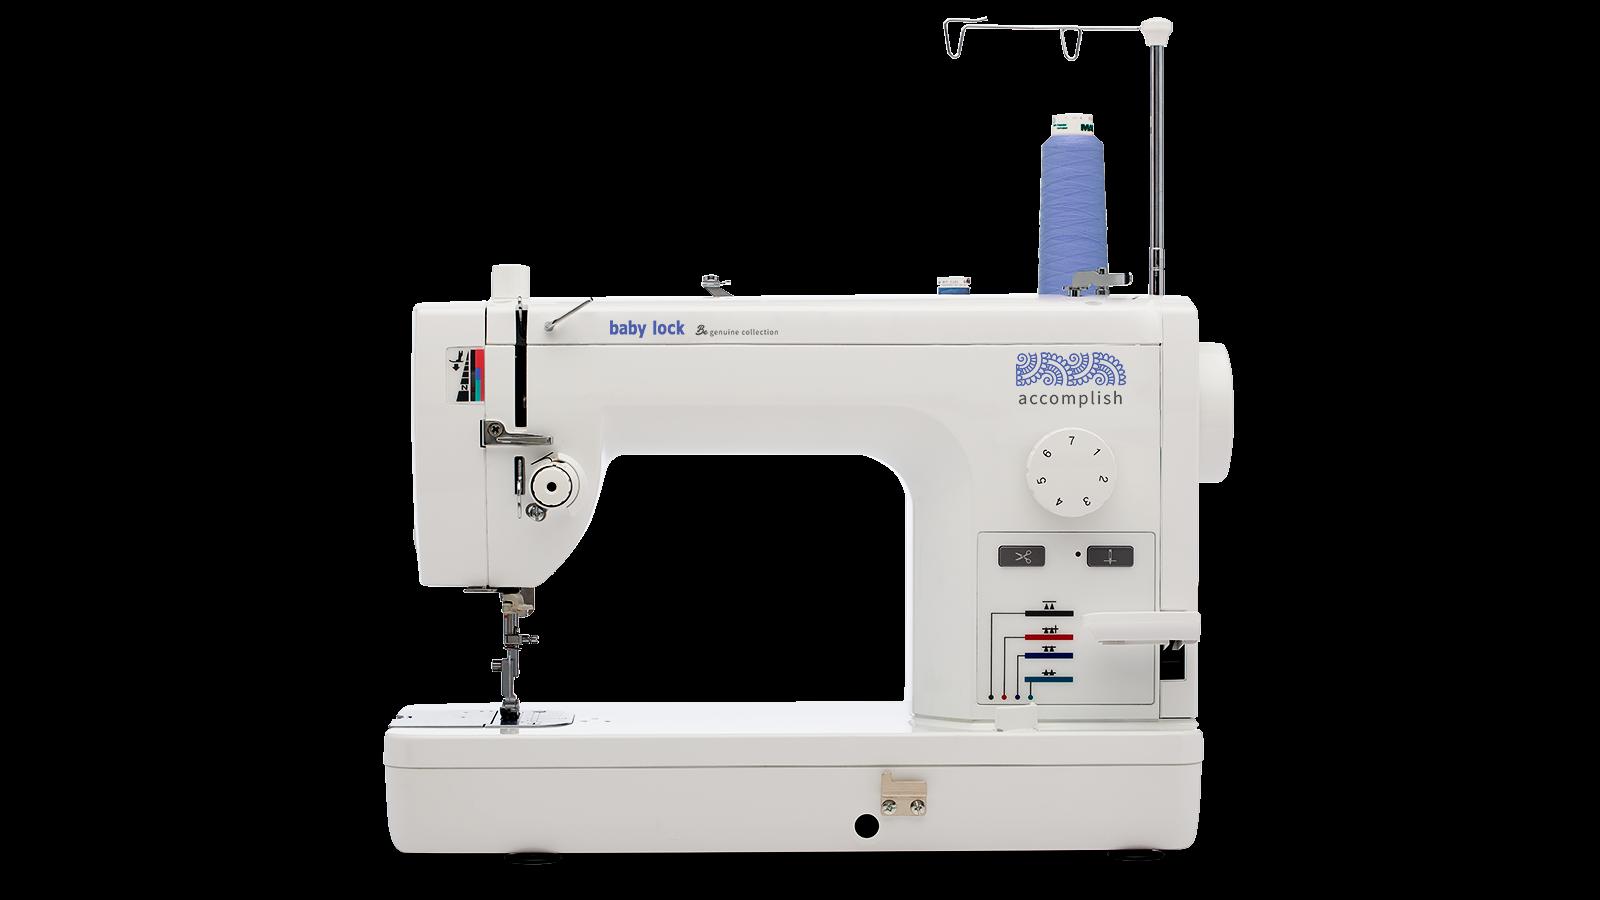 Baby Lock Accomplish Sewing Machine - FM